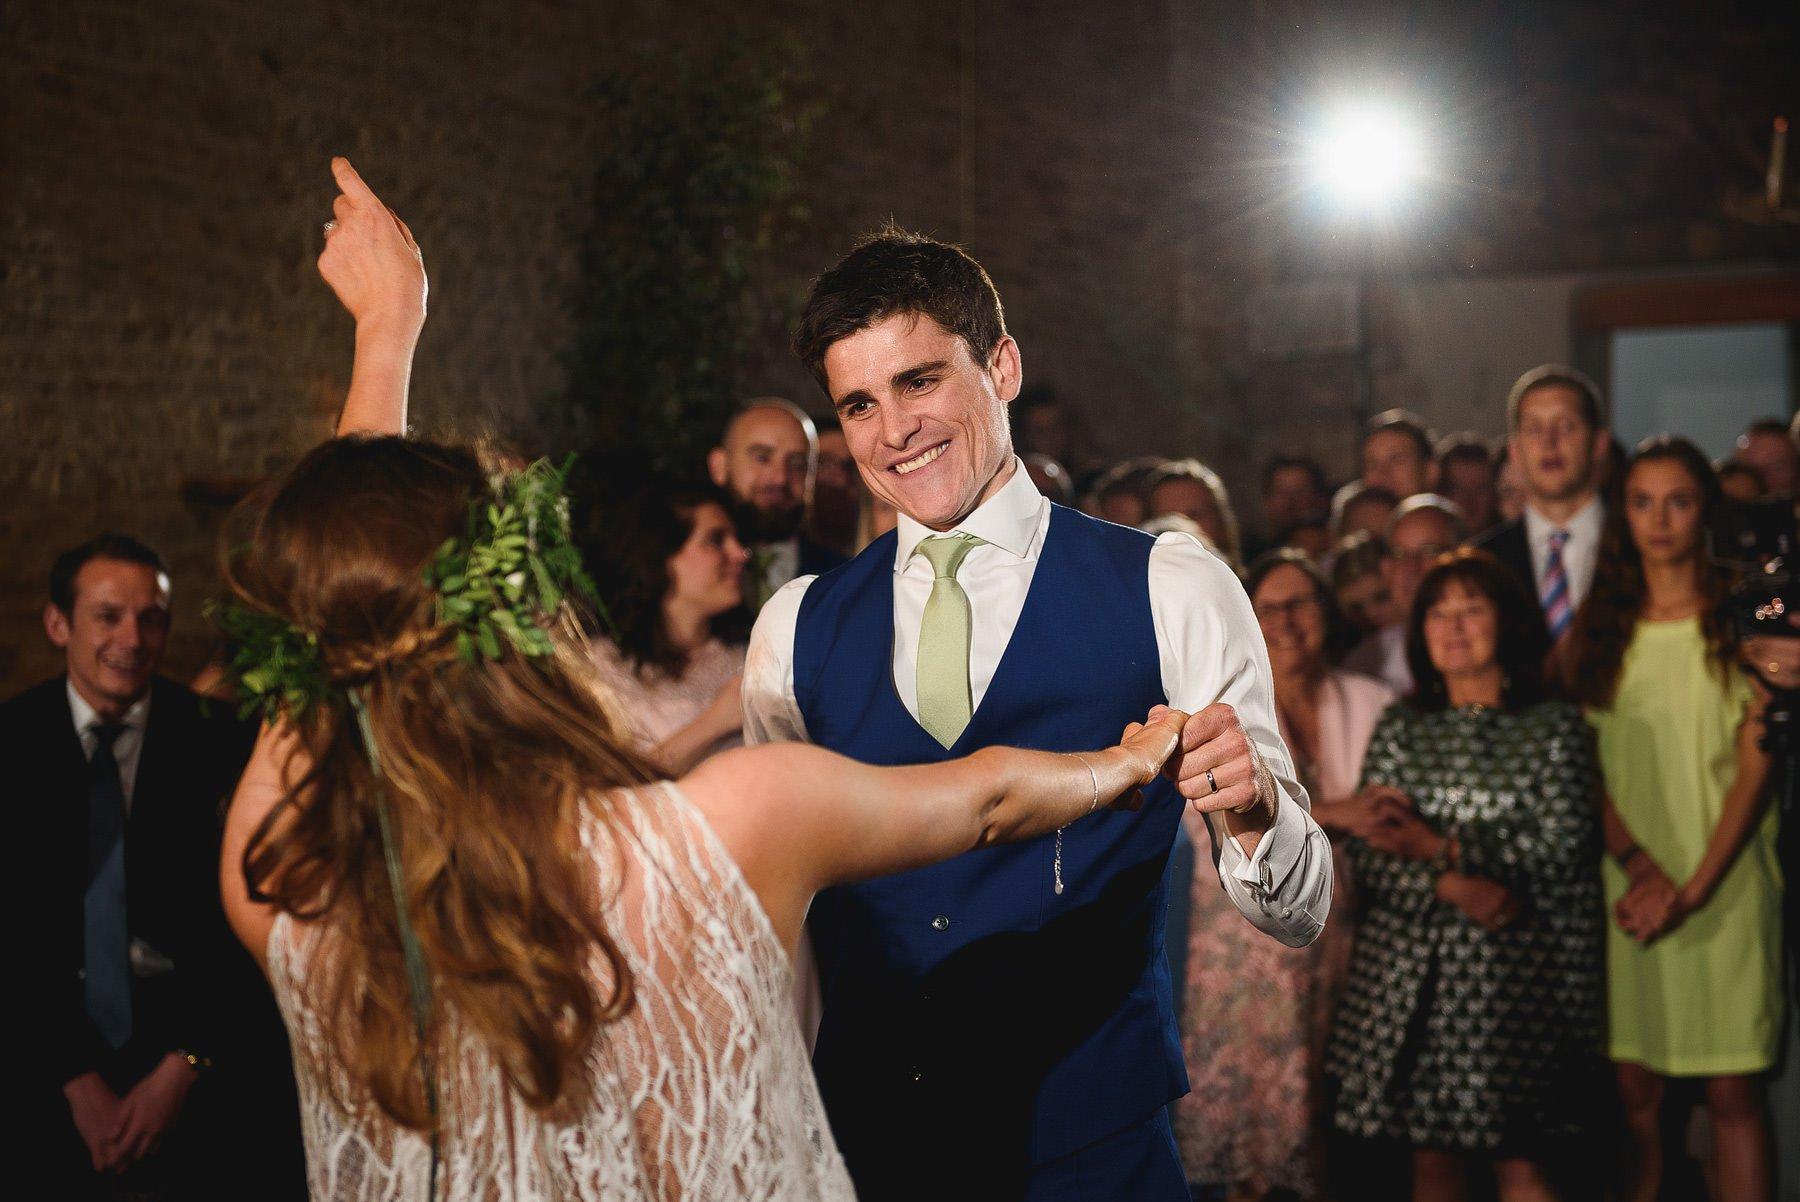 Oxfordshires wedding DJs